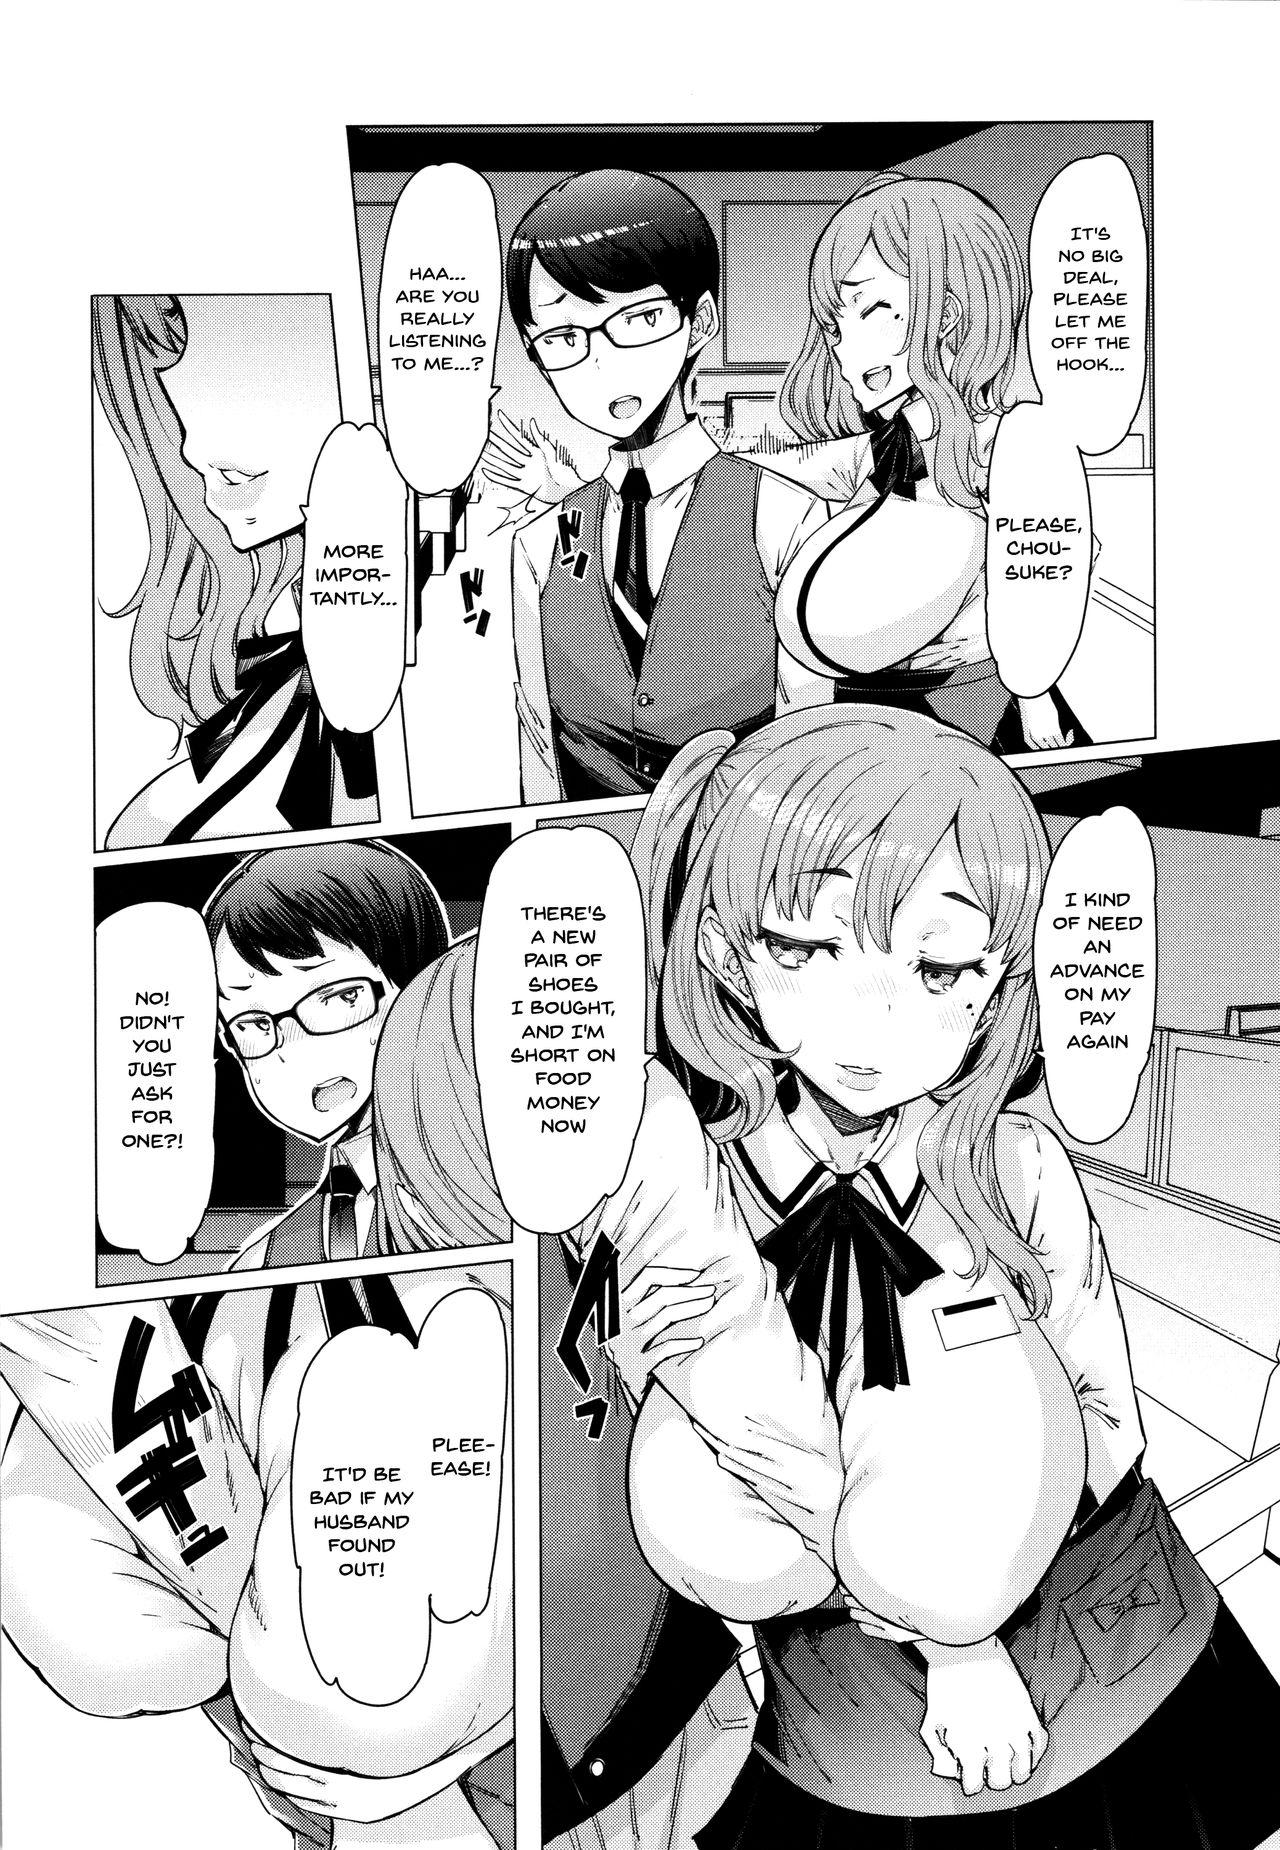 Hitozuma ga Ero Sugite Shigoto ni Naranai!   These Housewives Are Too Lewd I Can't Help It! 7